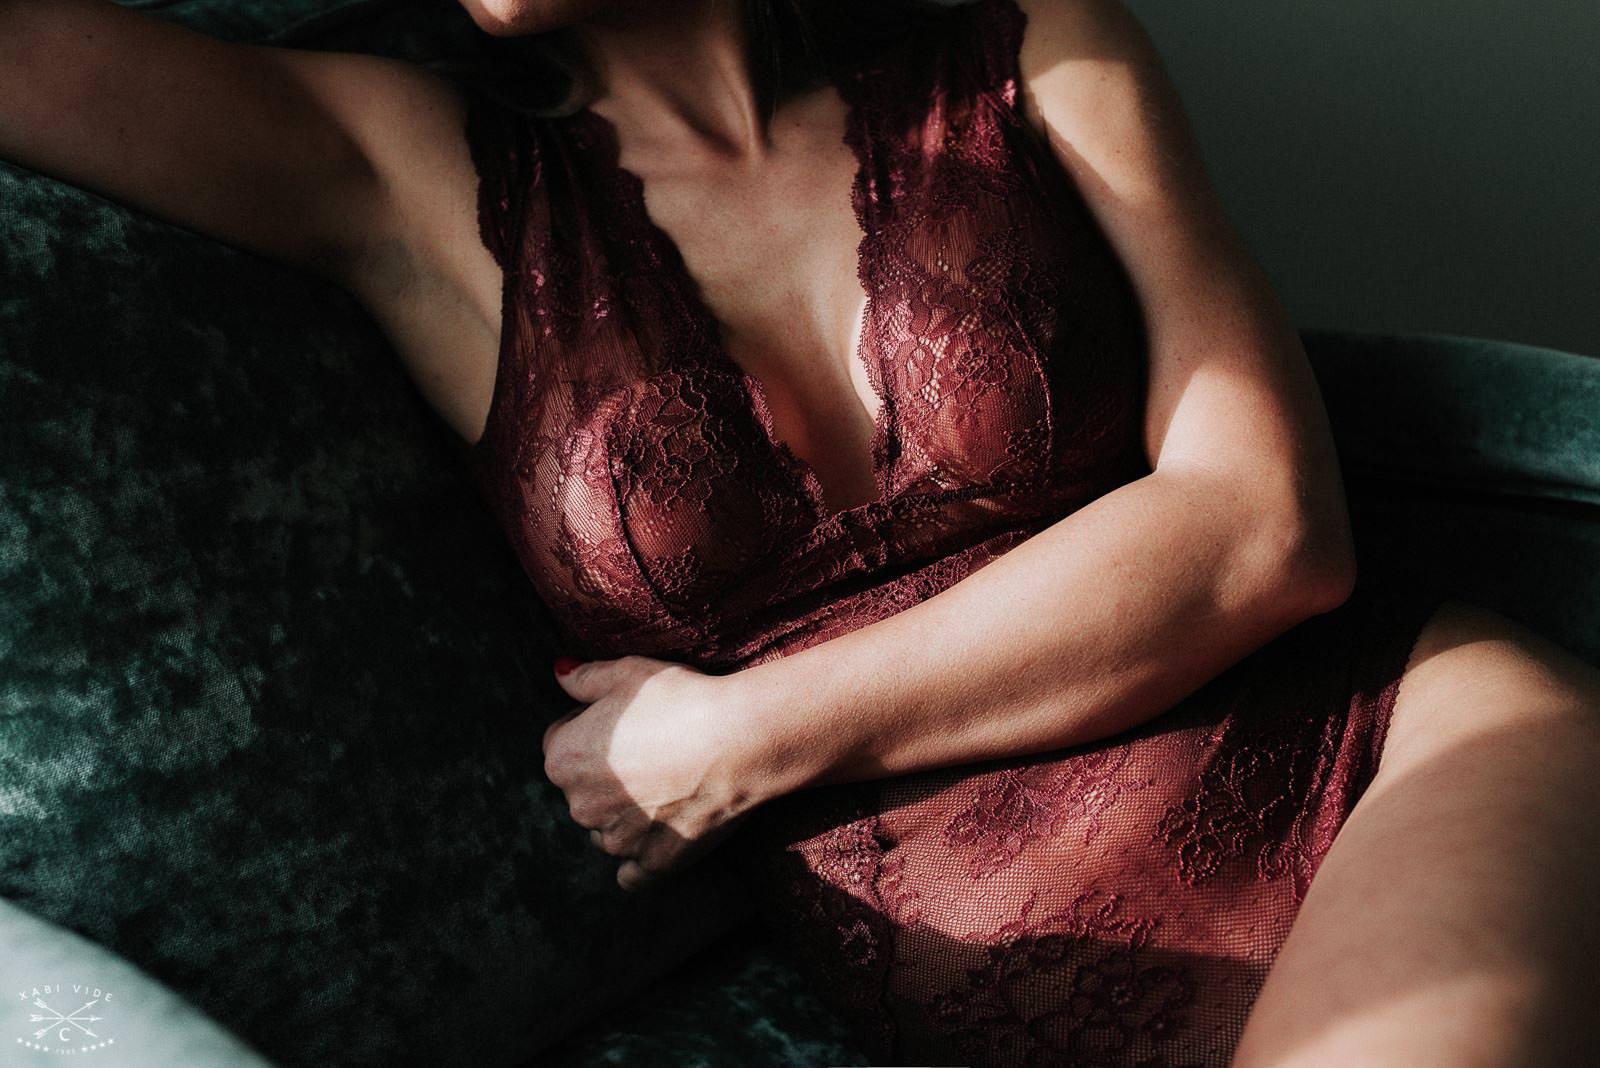 fotografía boudoir-2